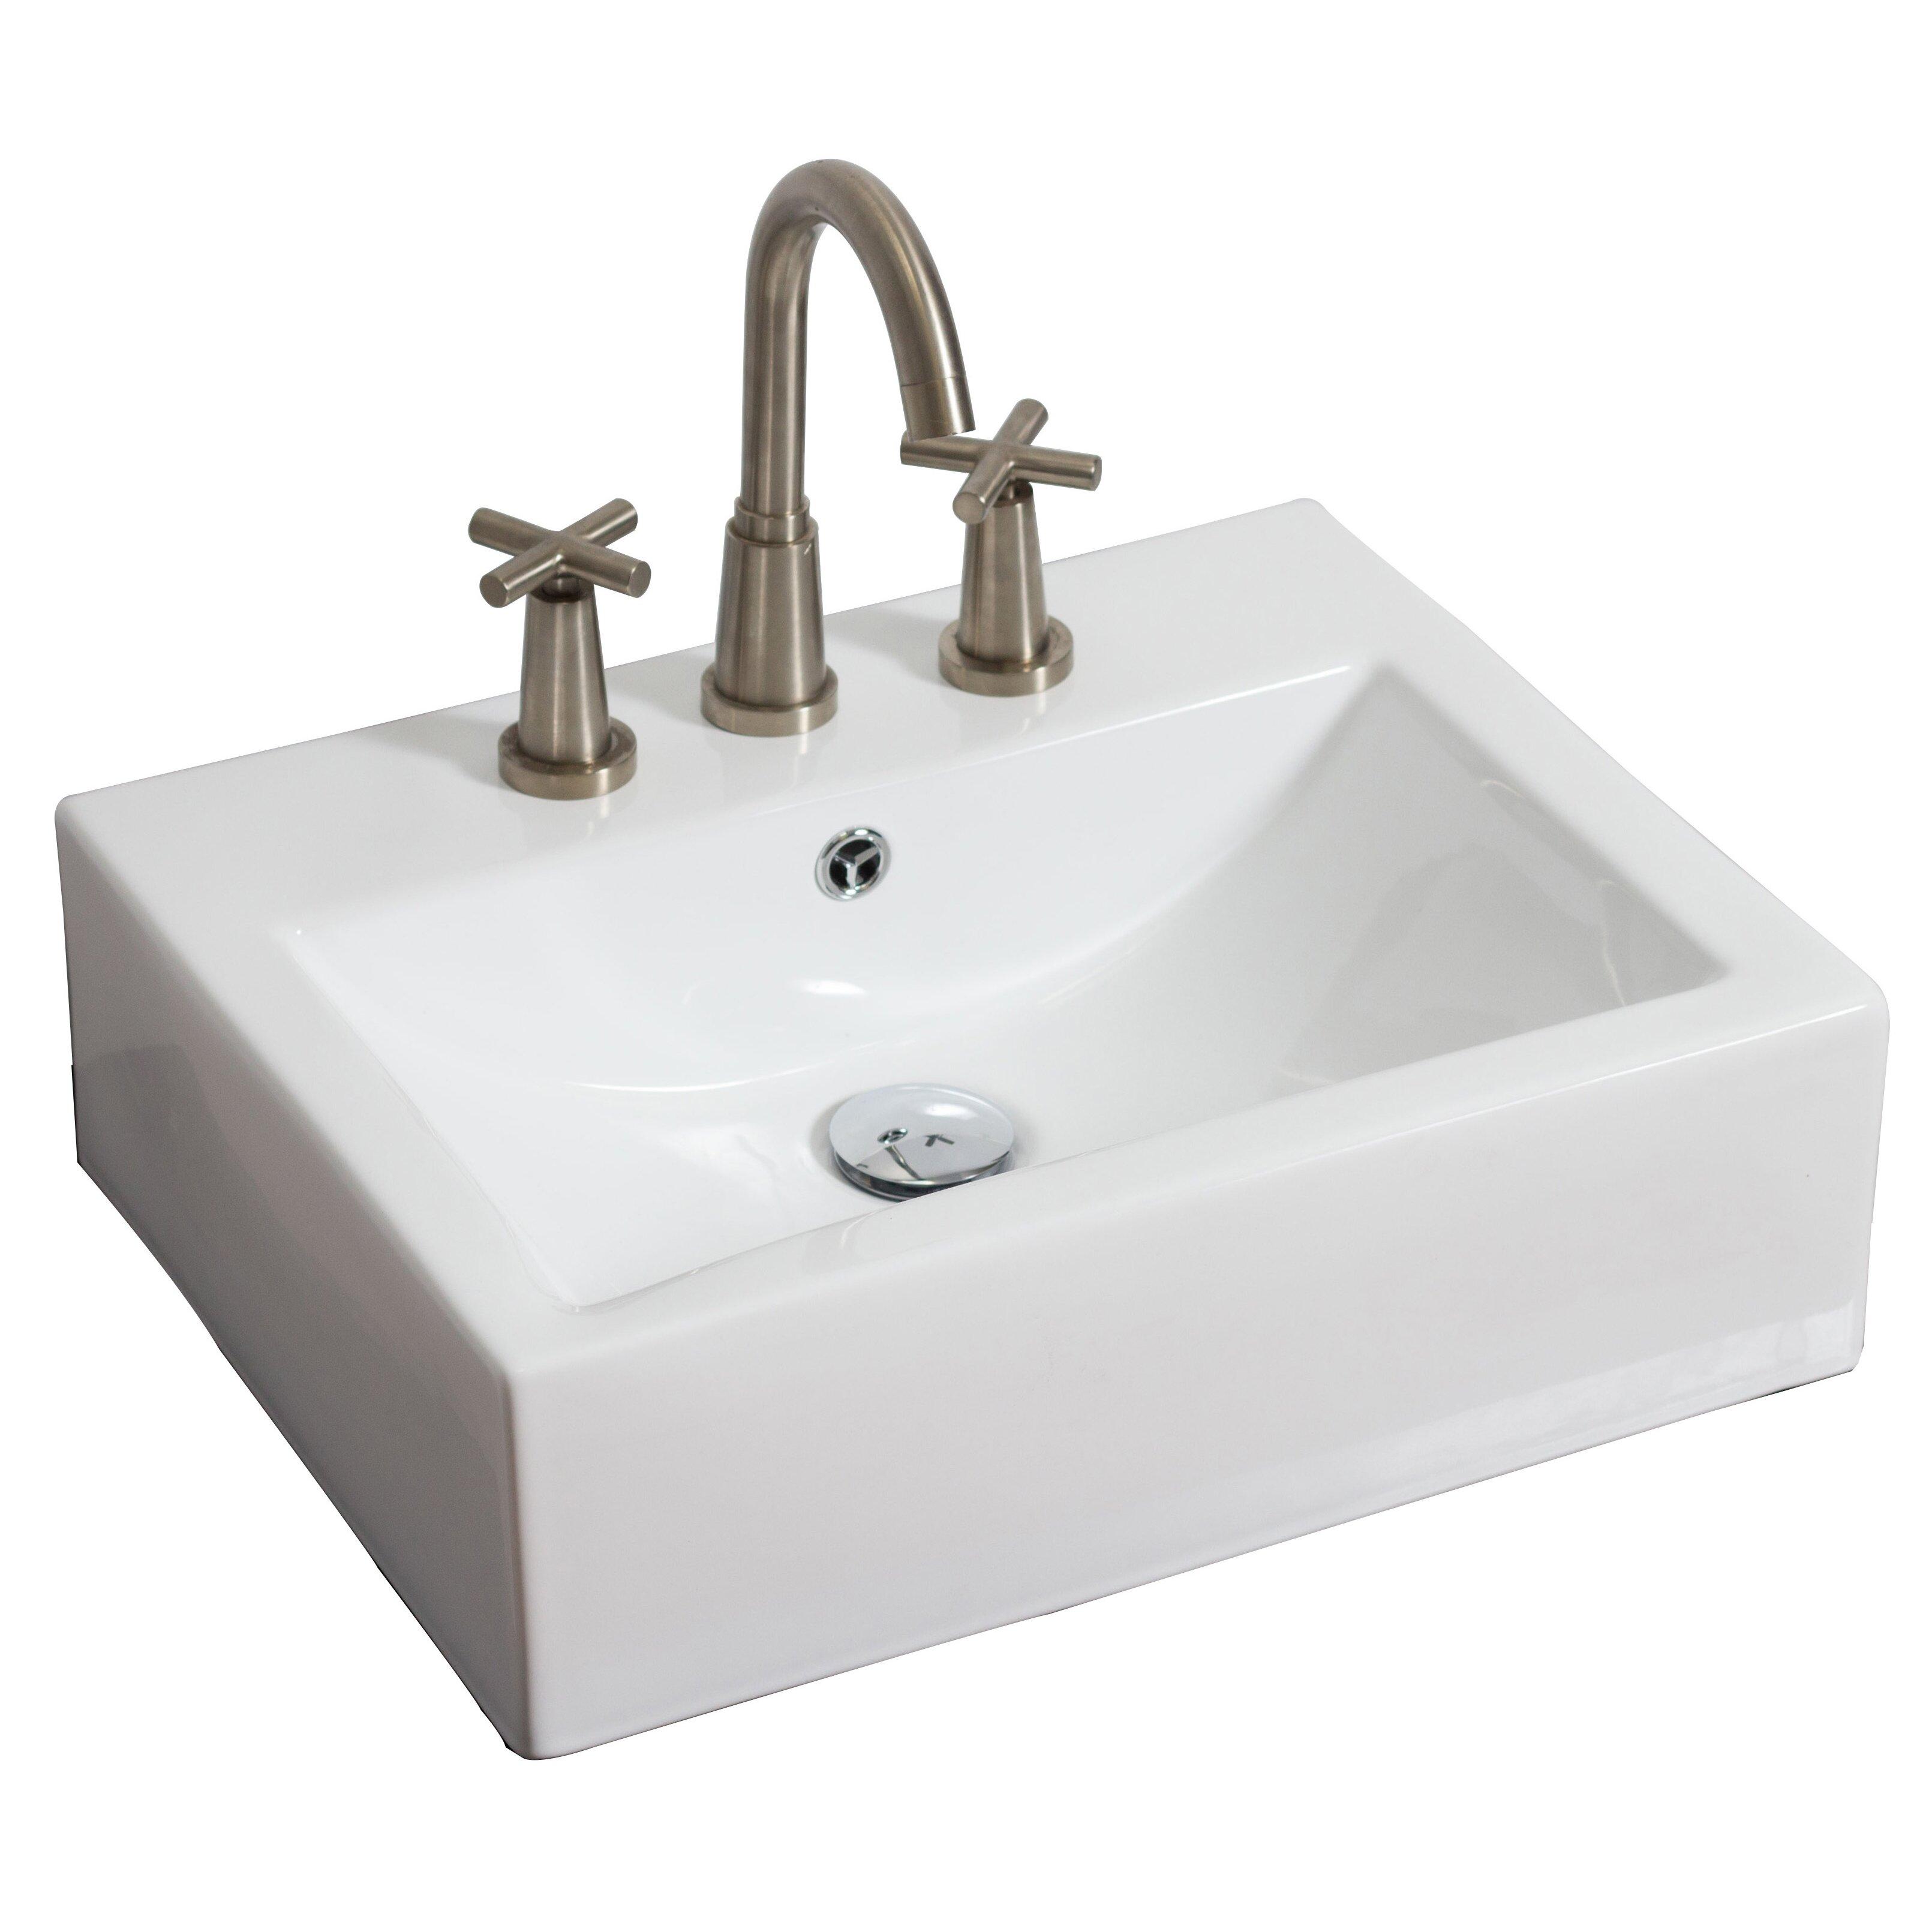 Wall Mounted Rectangle Vessel Bathroom Sink